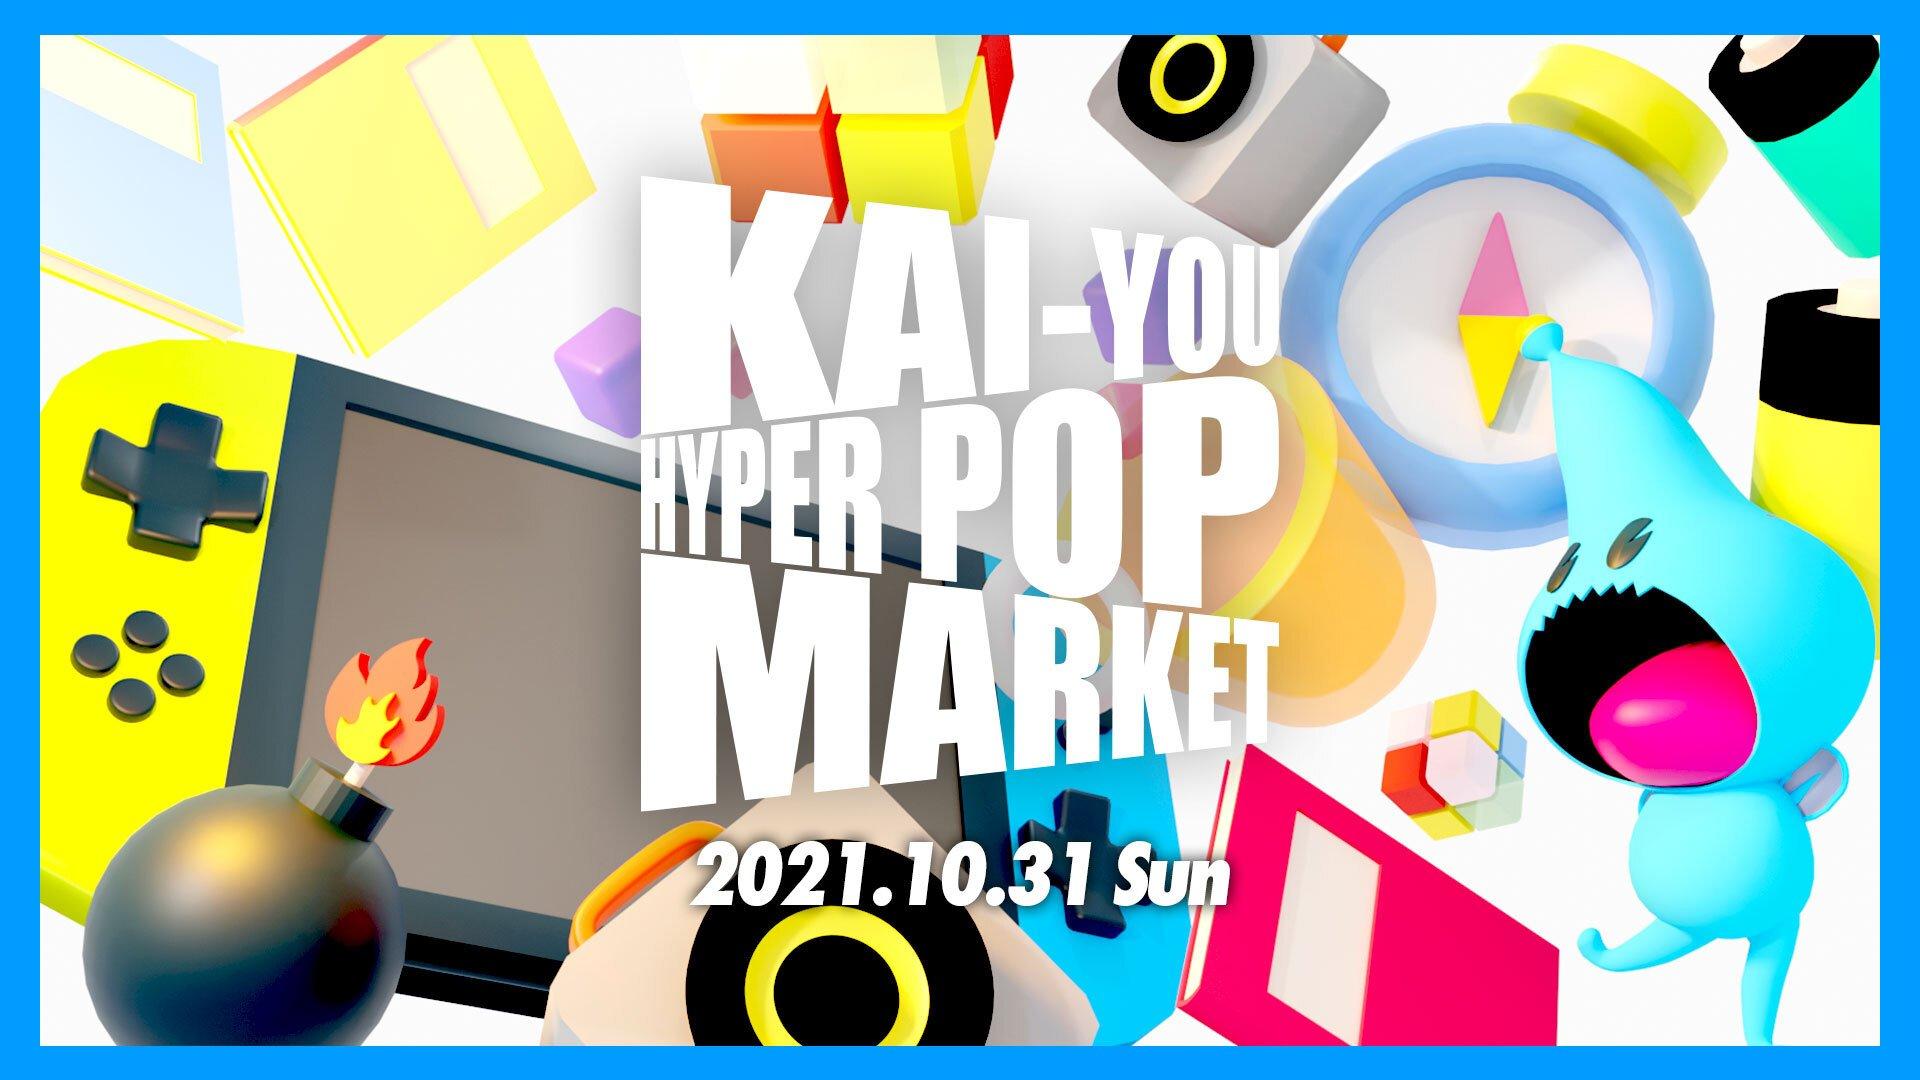 KAI-YOU inc. 10周年イベント「KAI-YOU HYPER POP MARKET」開催のお知らせ